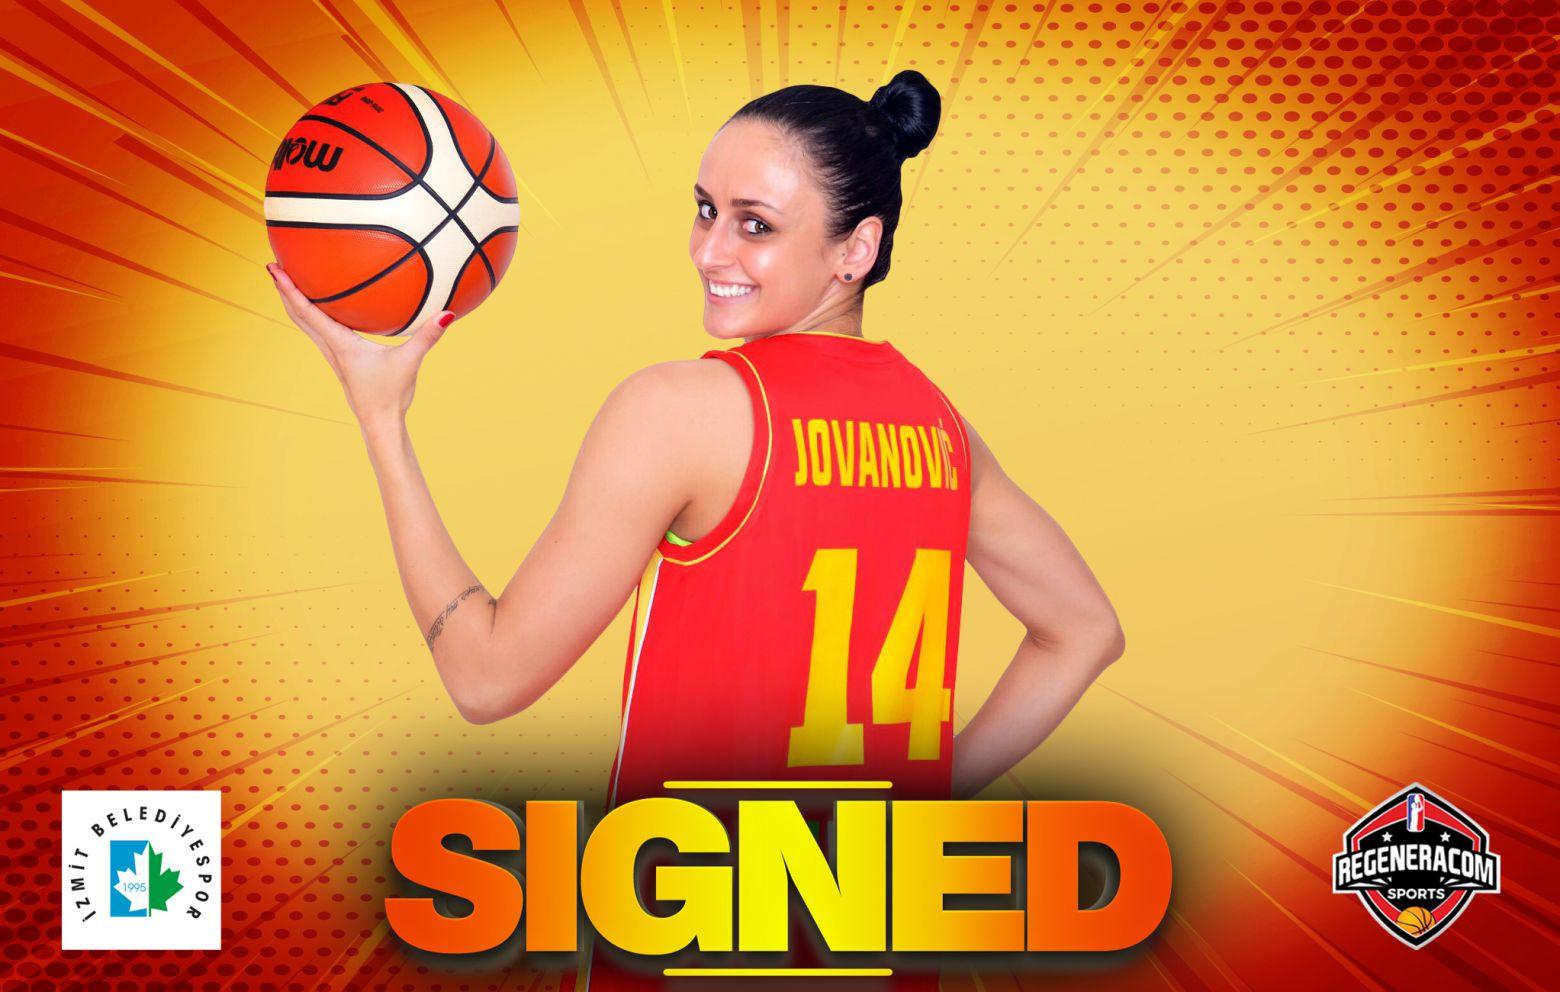 MILICA JOVANOVIC has signed in Turkey with Izmit